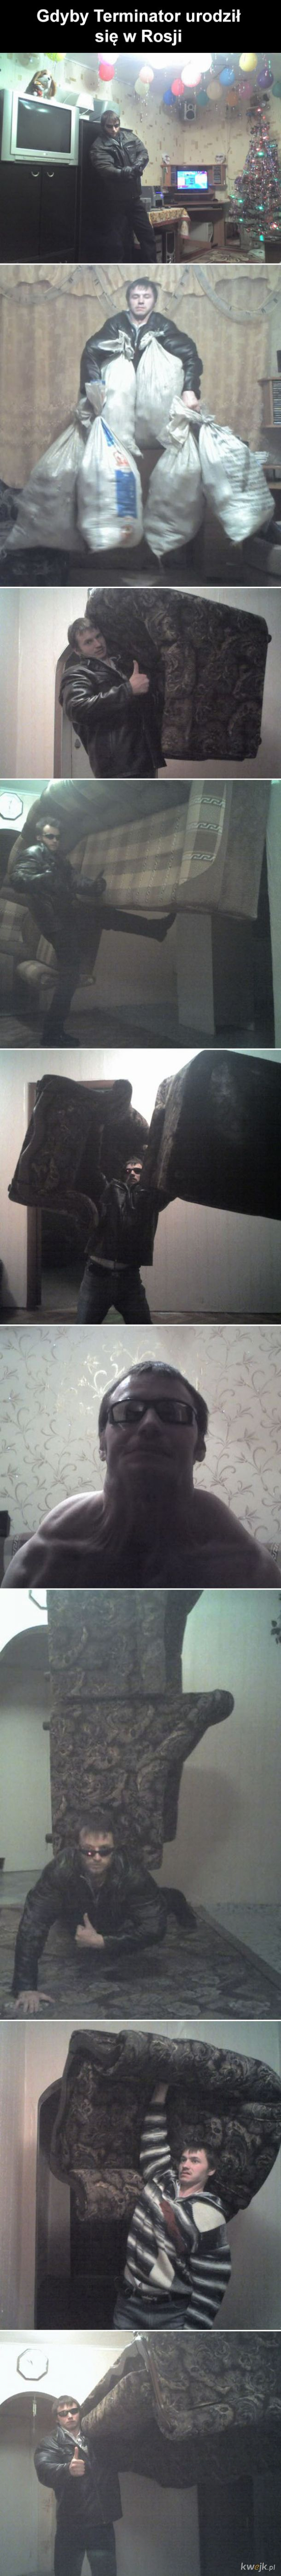 Terminator w Rosji